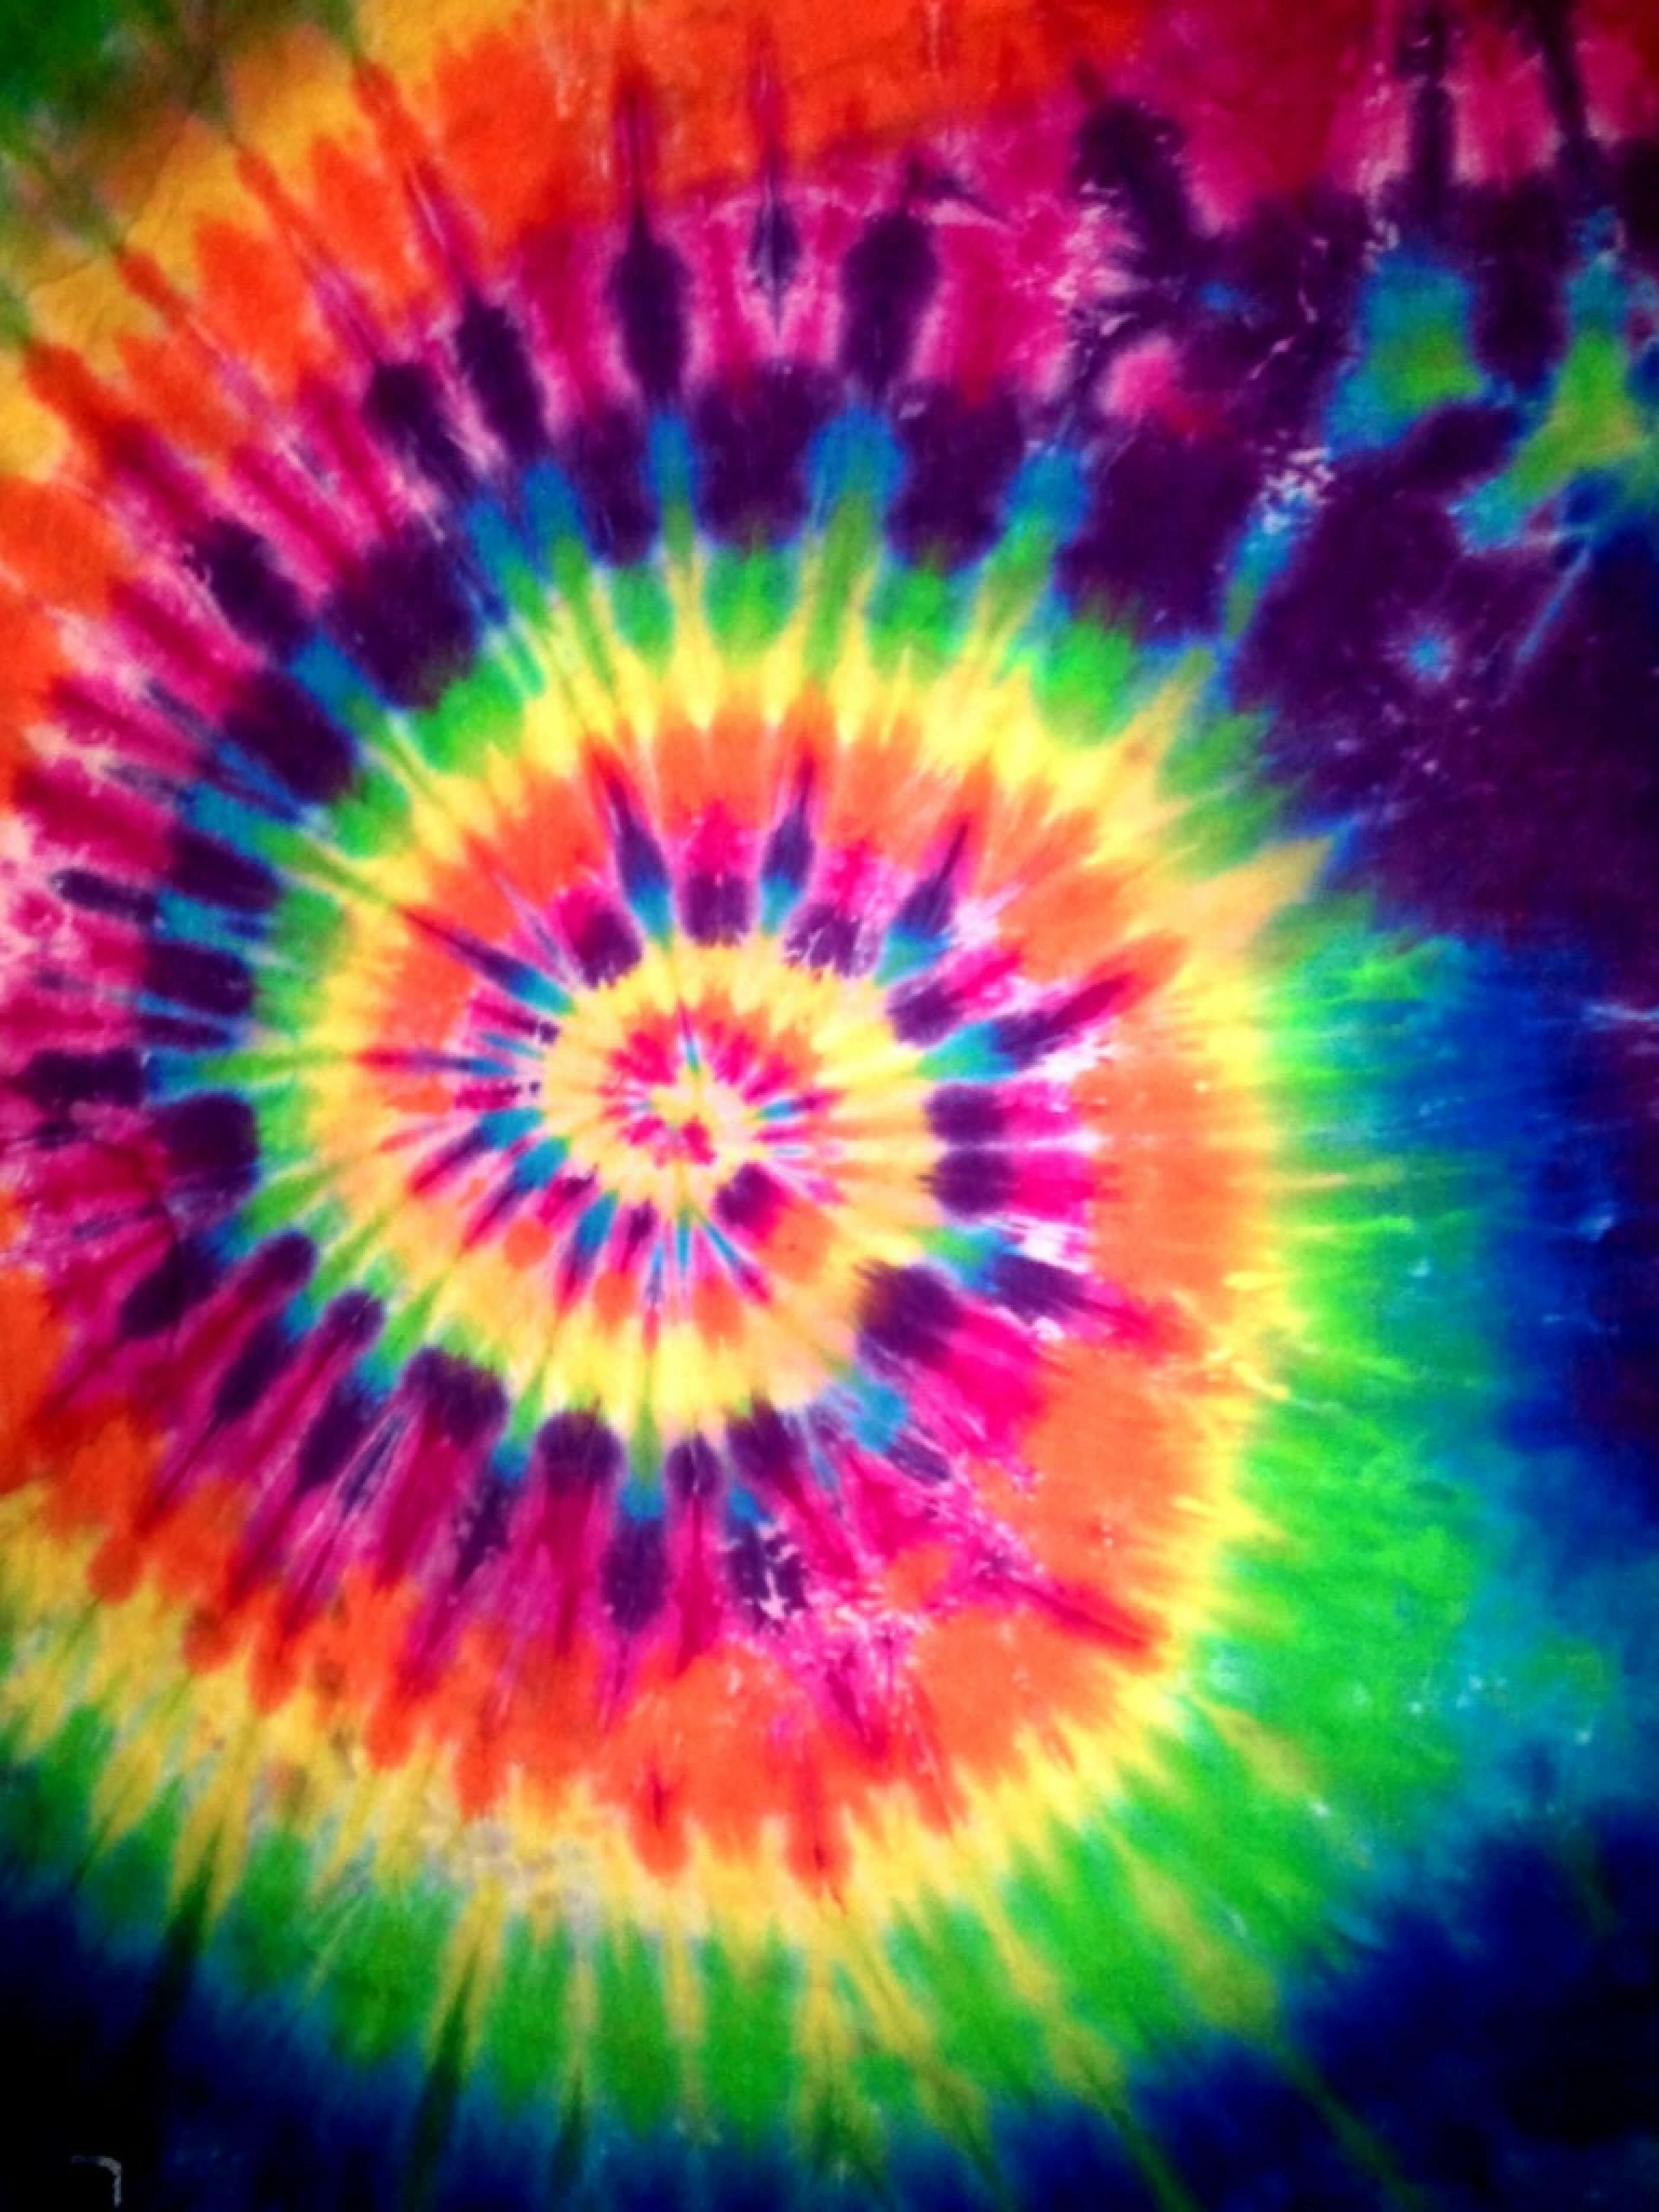 Free Tie Dye Wallpaper For Samsung 4k Hd Tye Dye Wallpaper